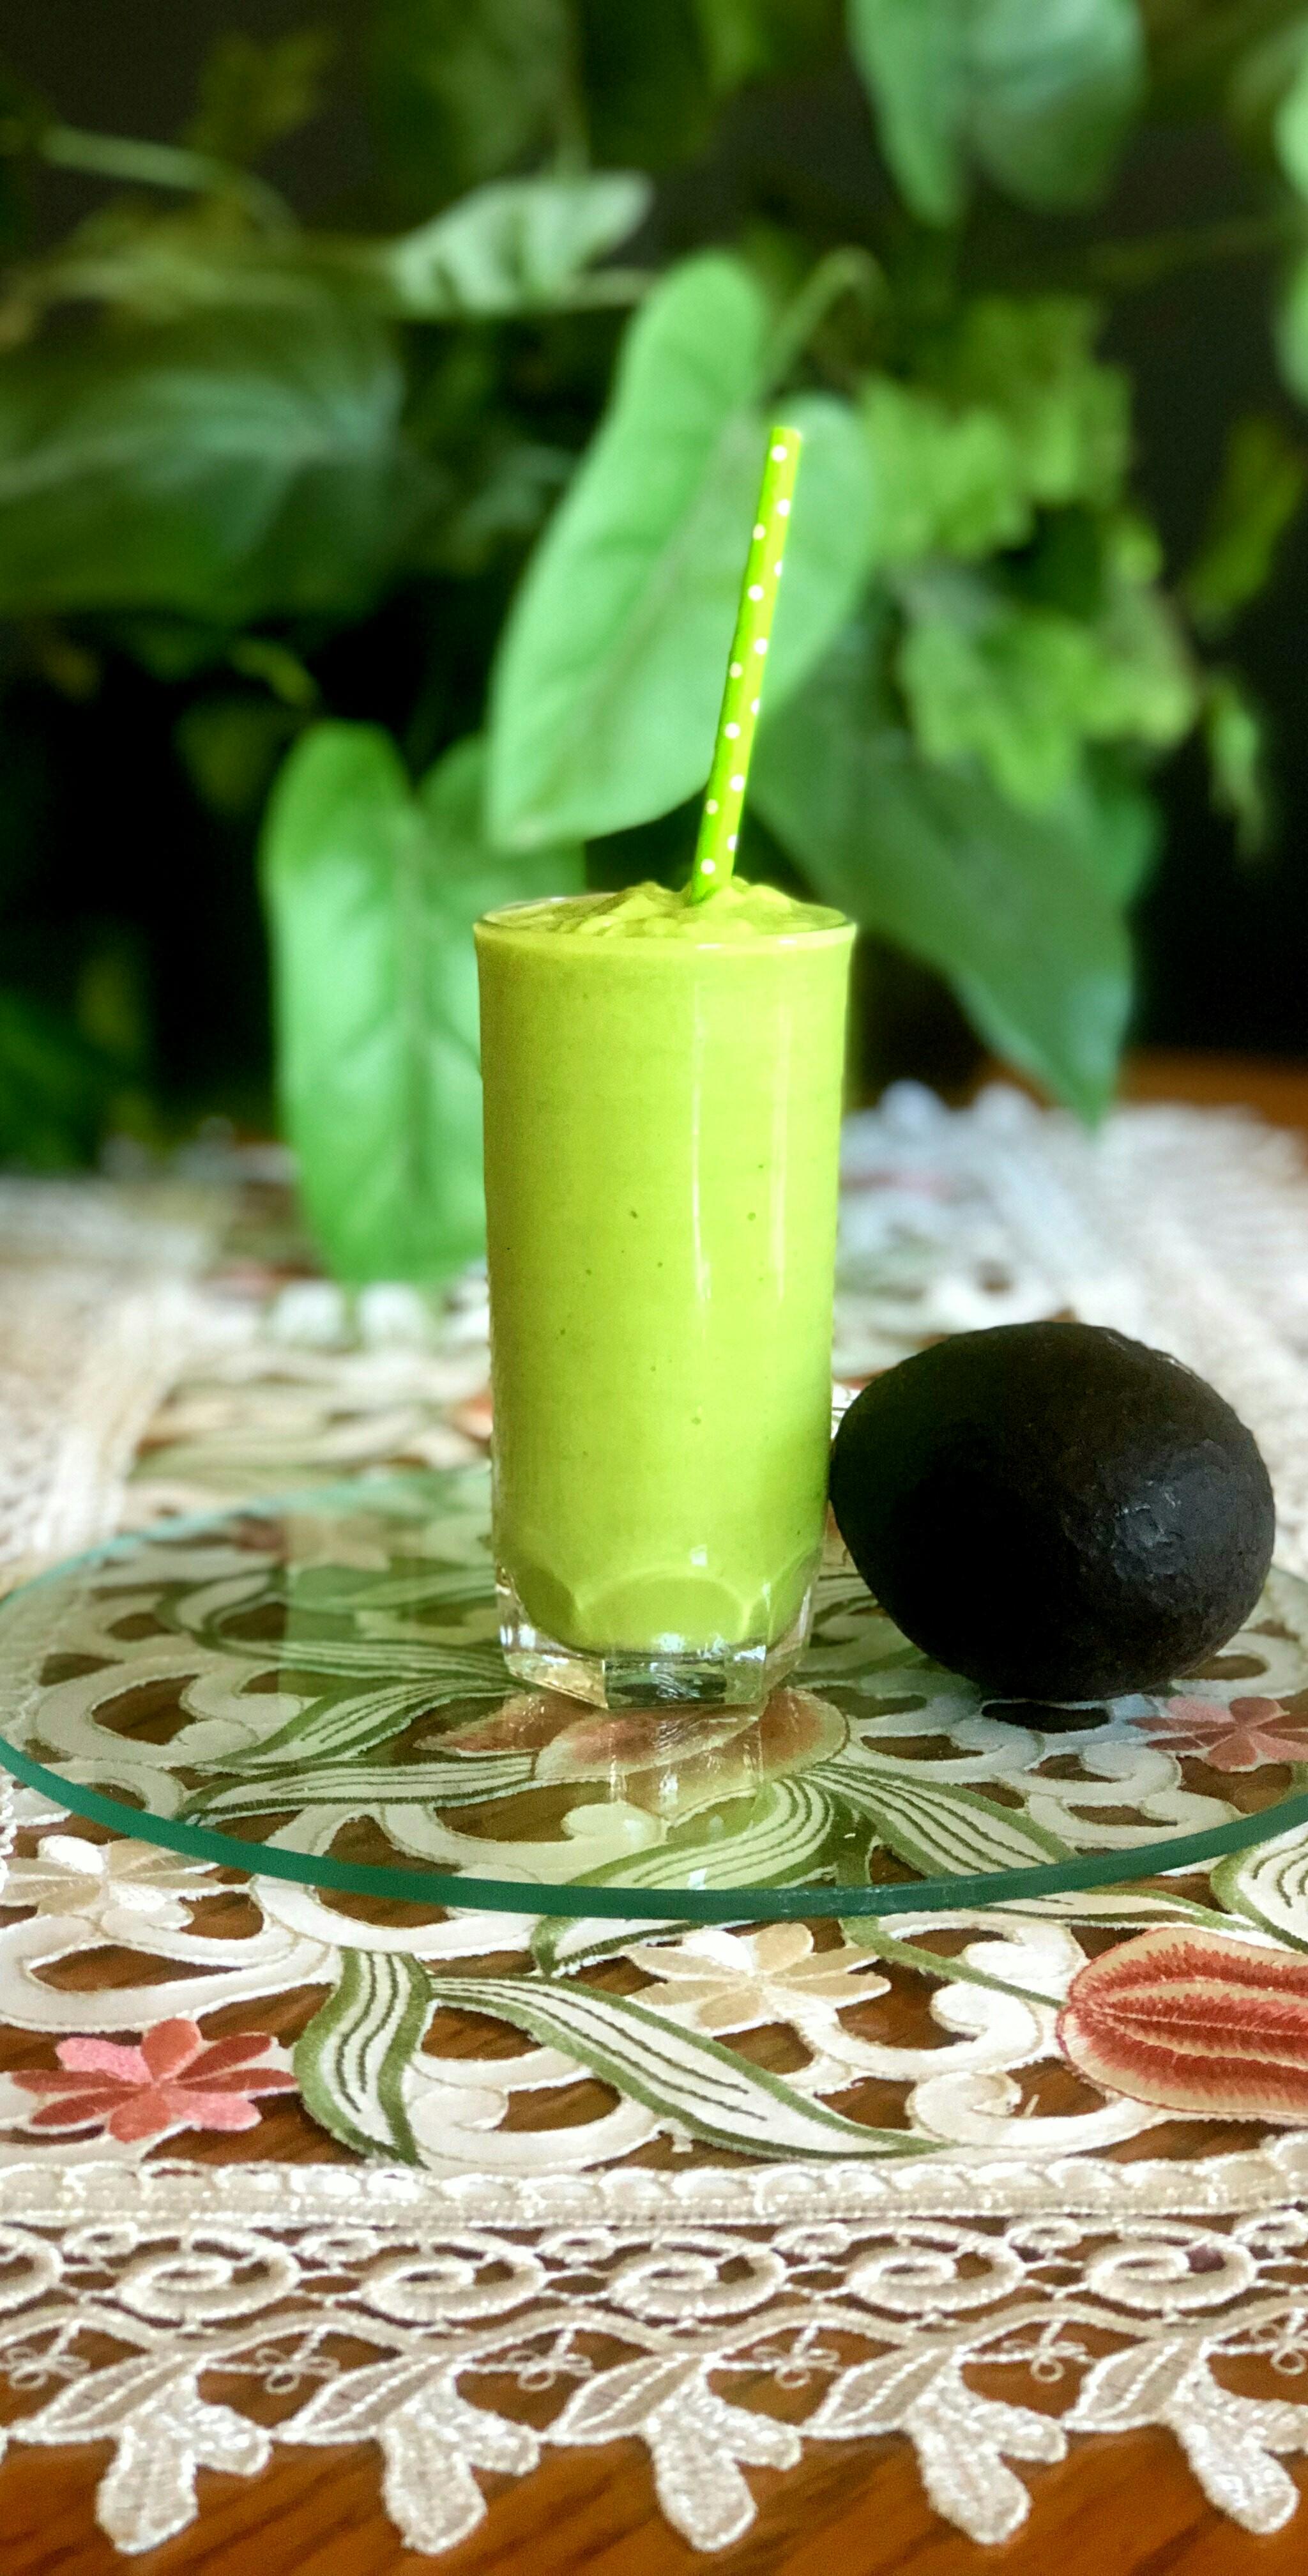 Keto Detox Green Smoothie for 2